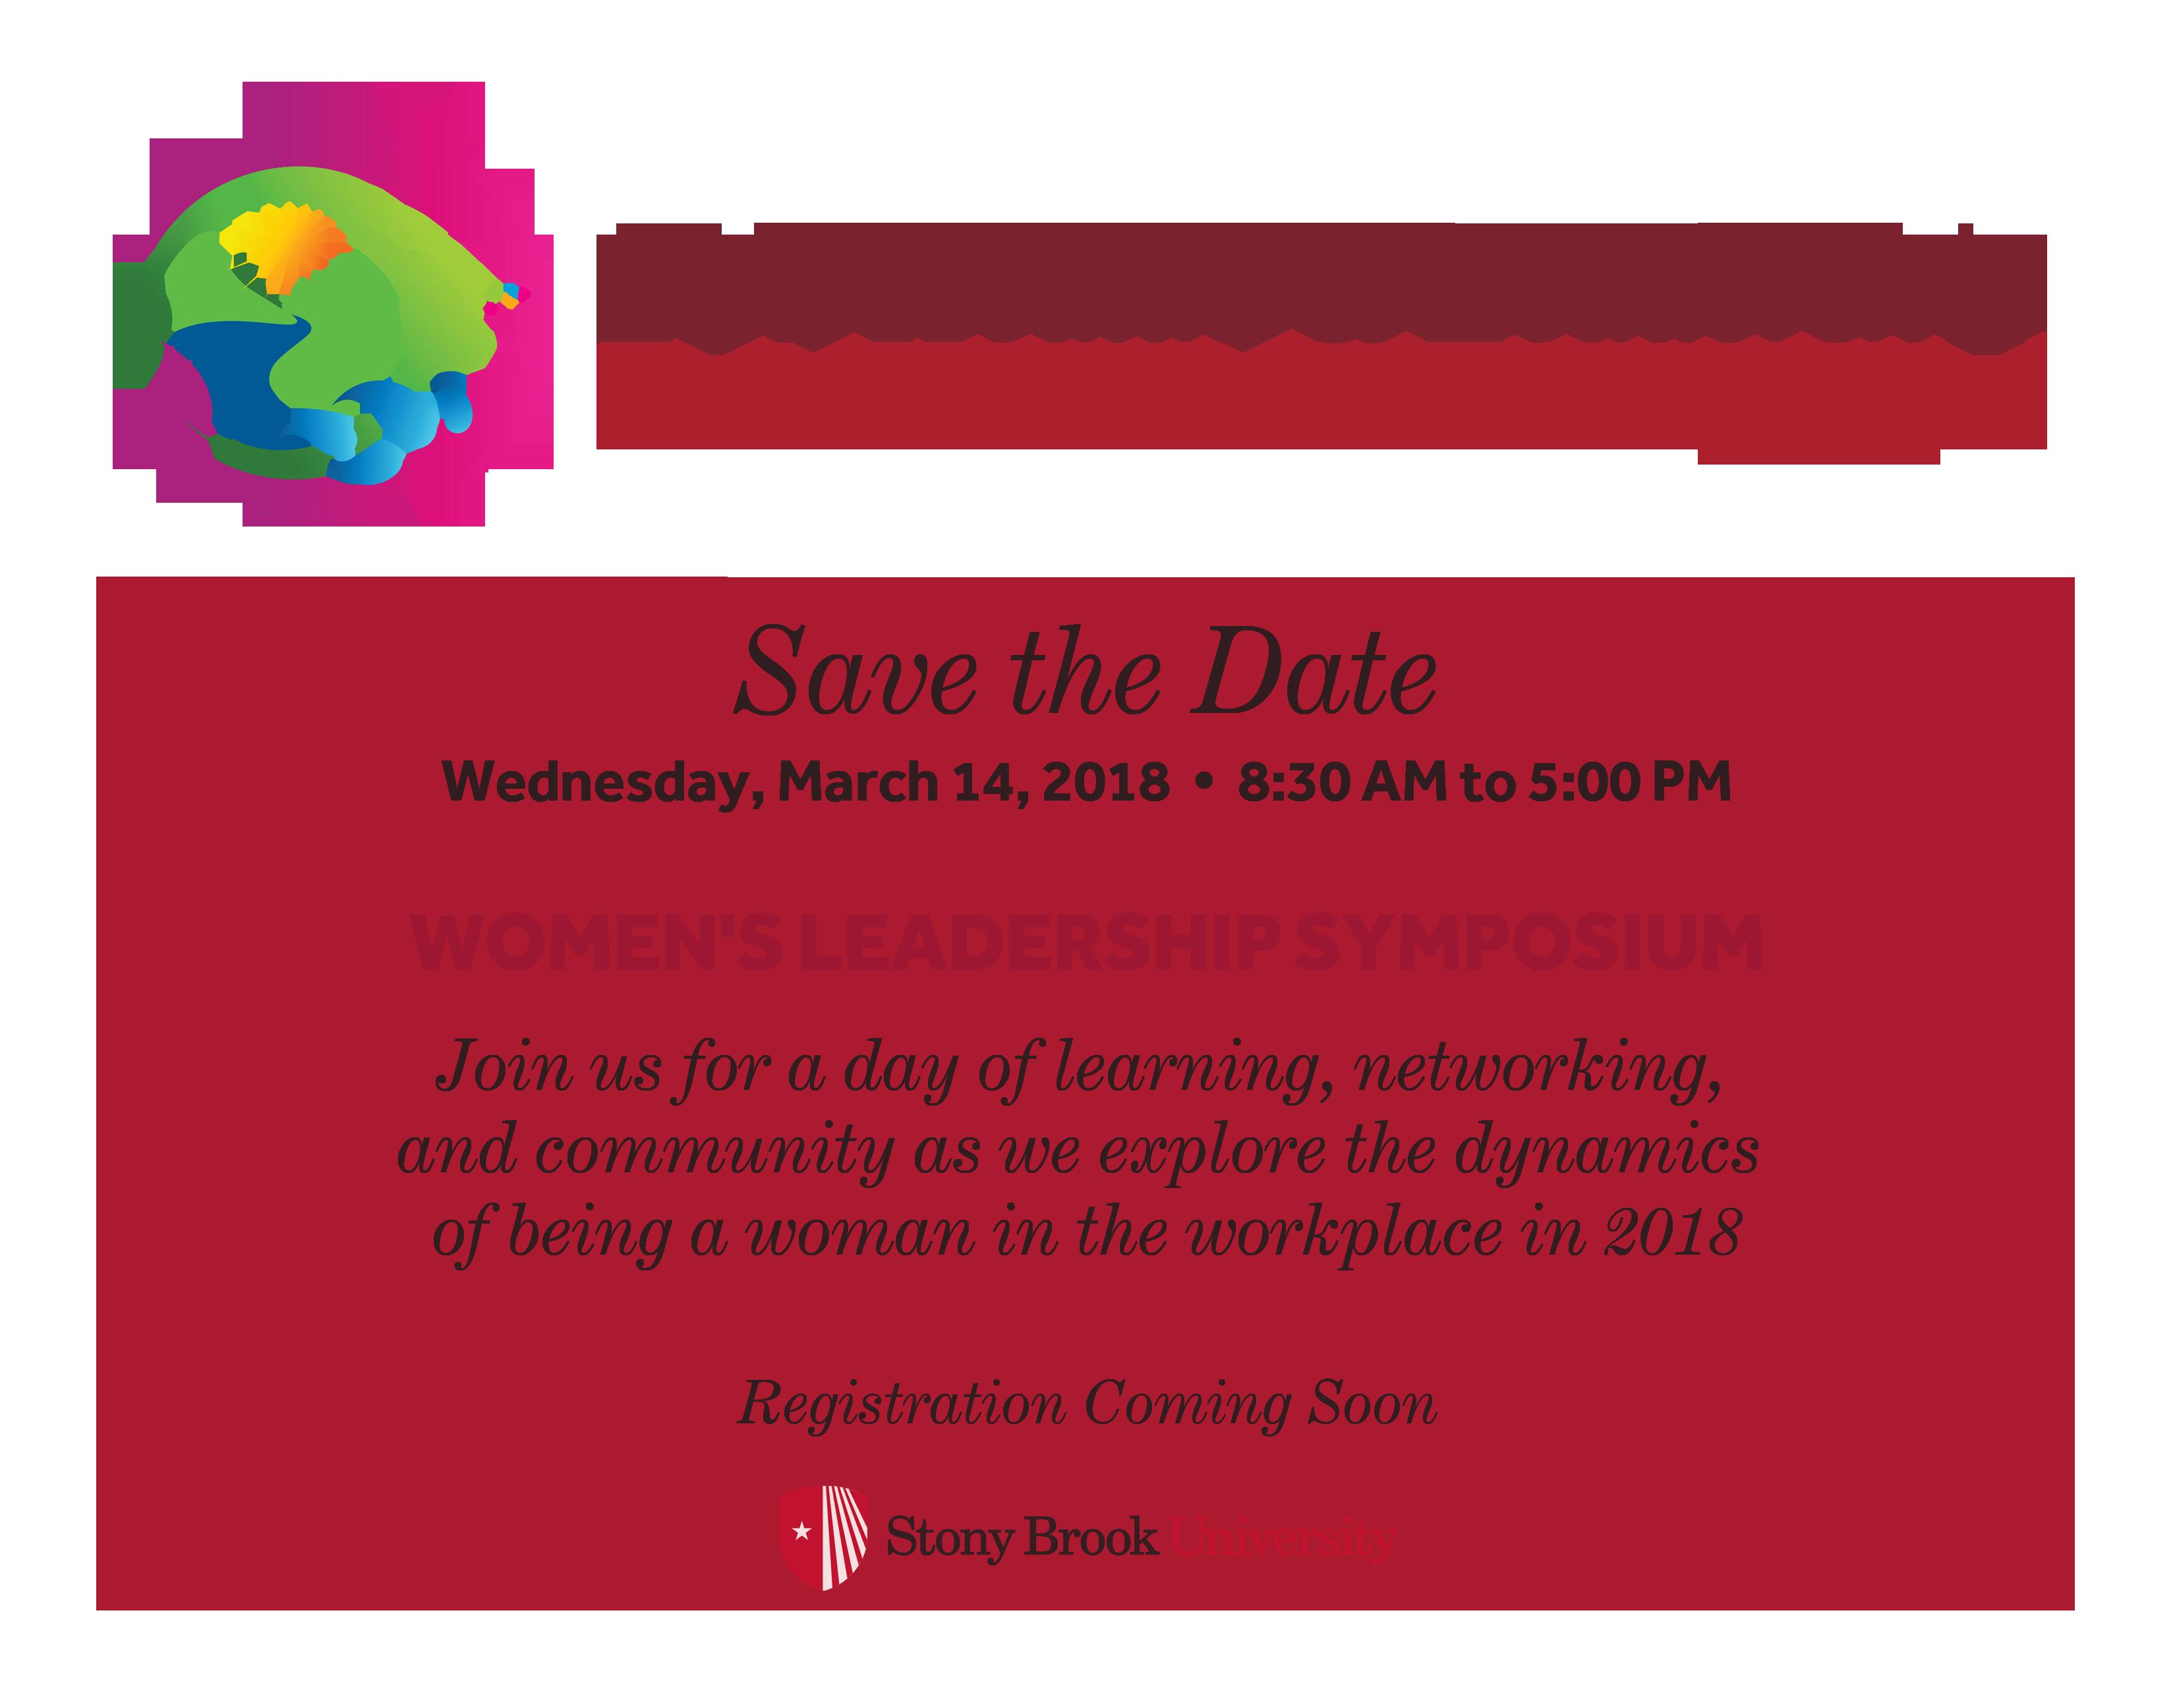 Save the date Women's leadership symposium, March 14, 2018 Stony Brook University